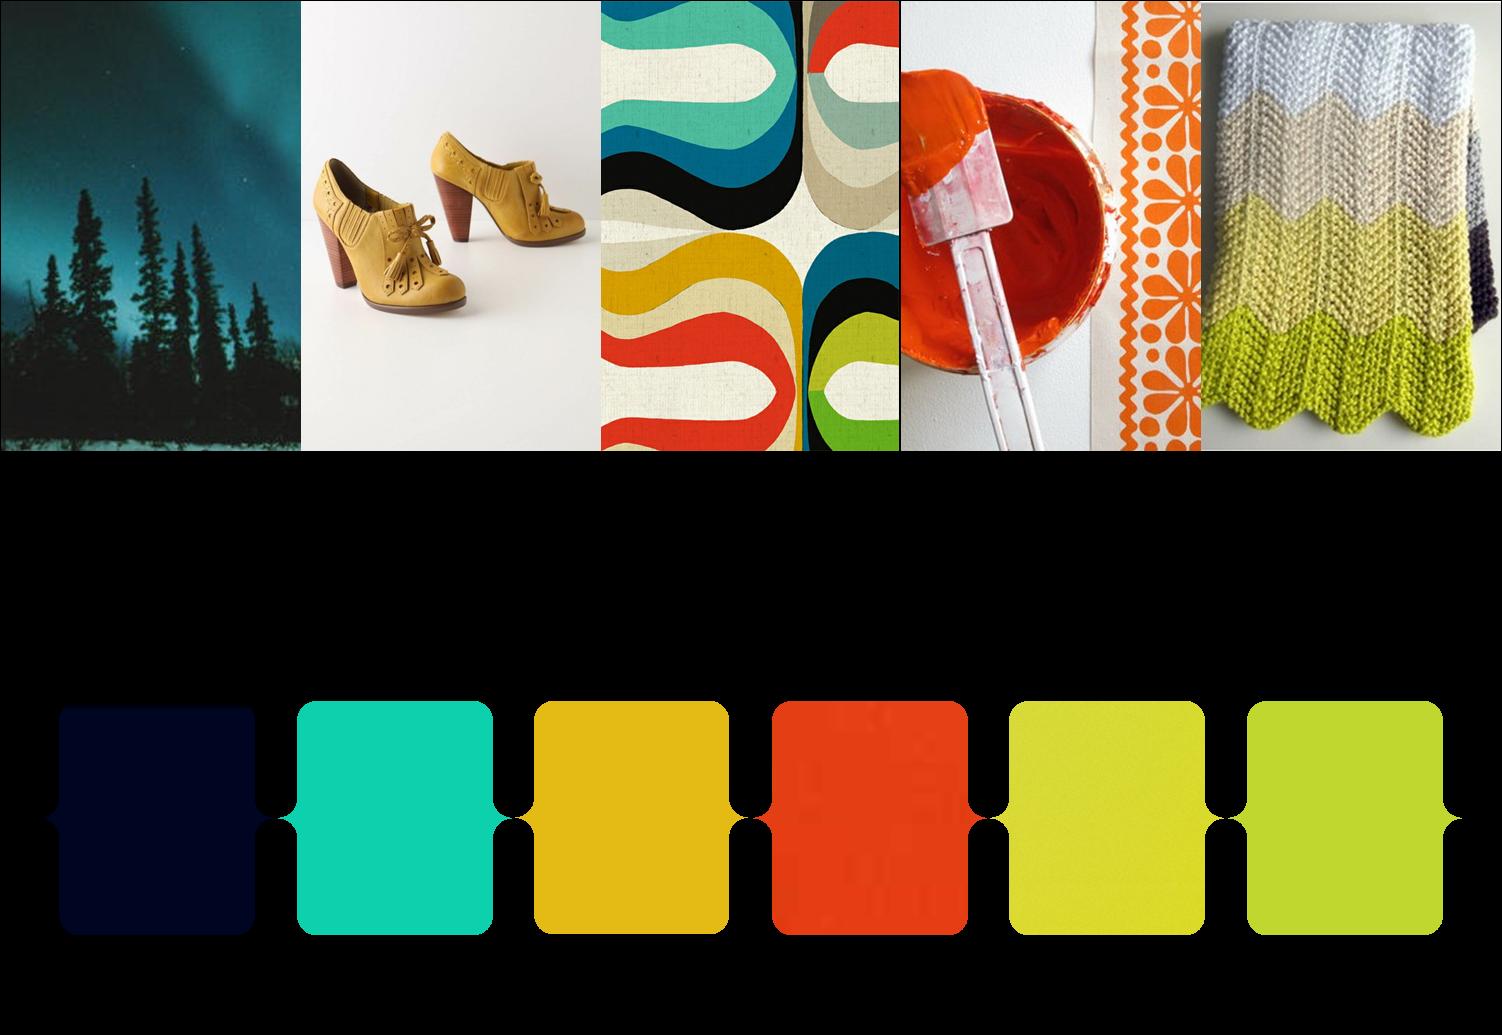 bird dog wedding colorful retro. Black Bedroom Furniture Sets. Home Design Ideas